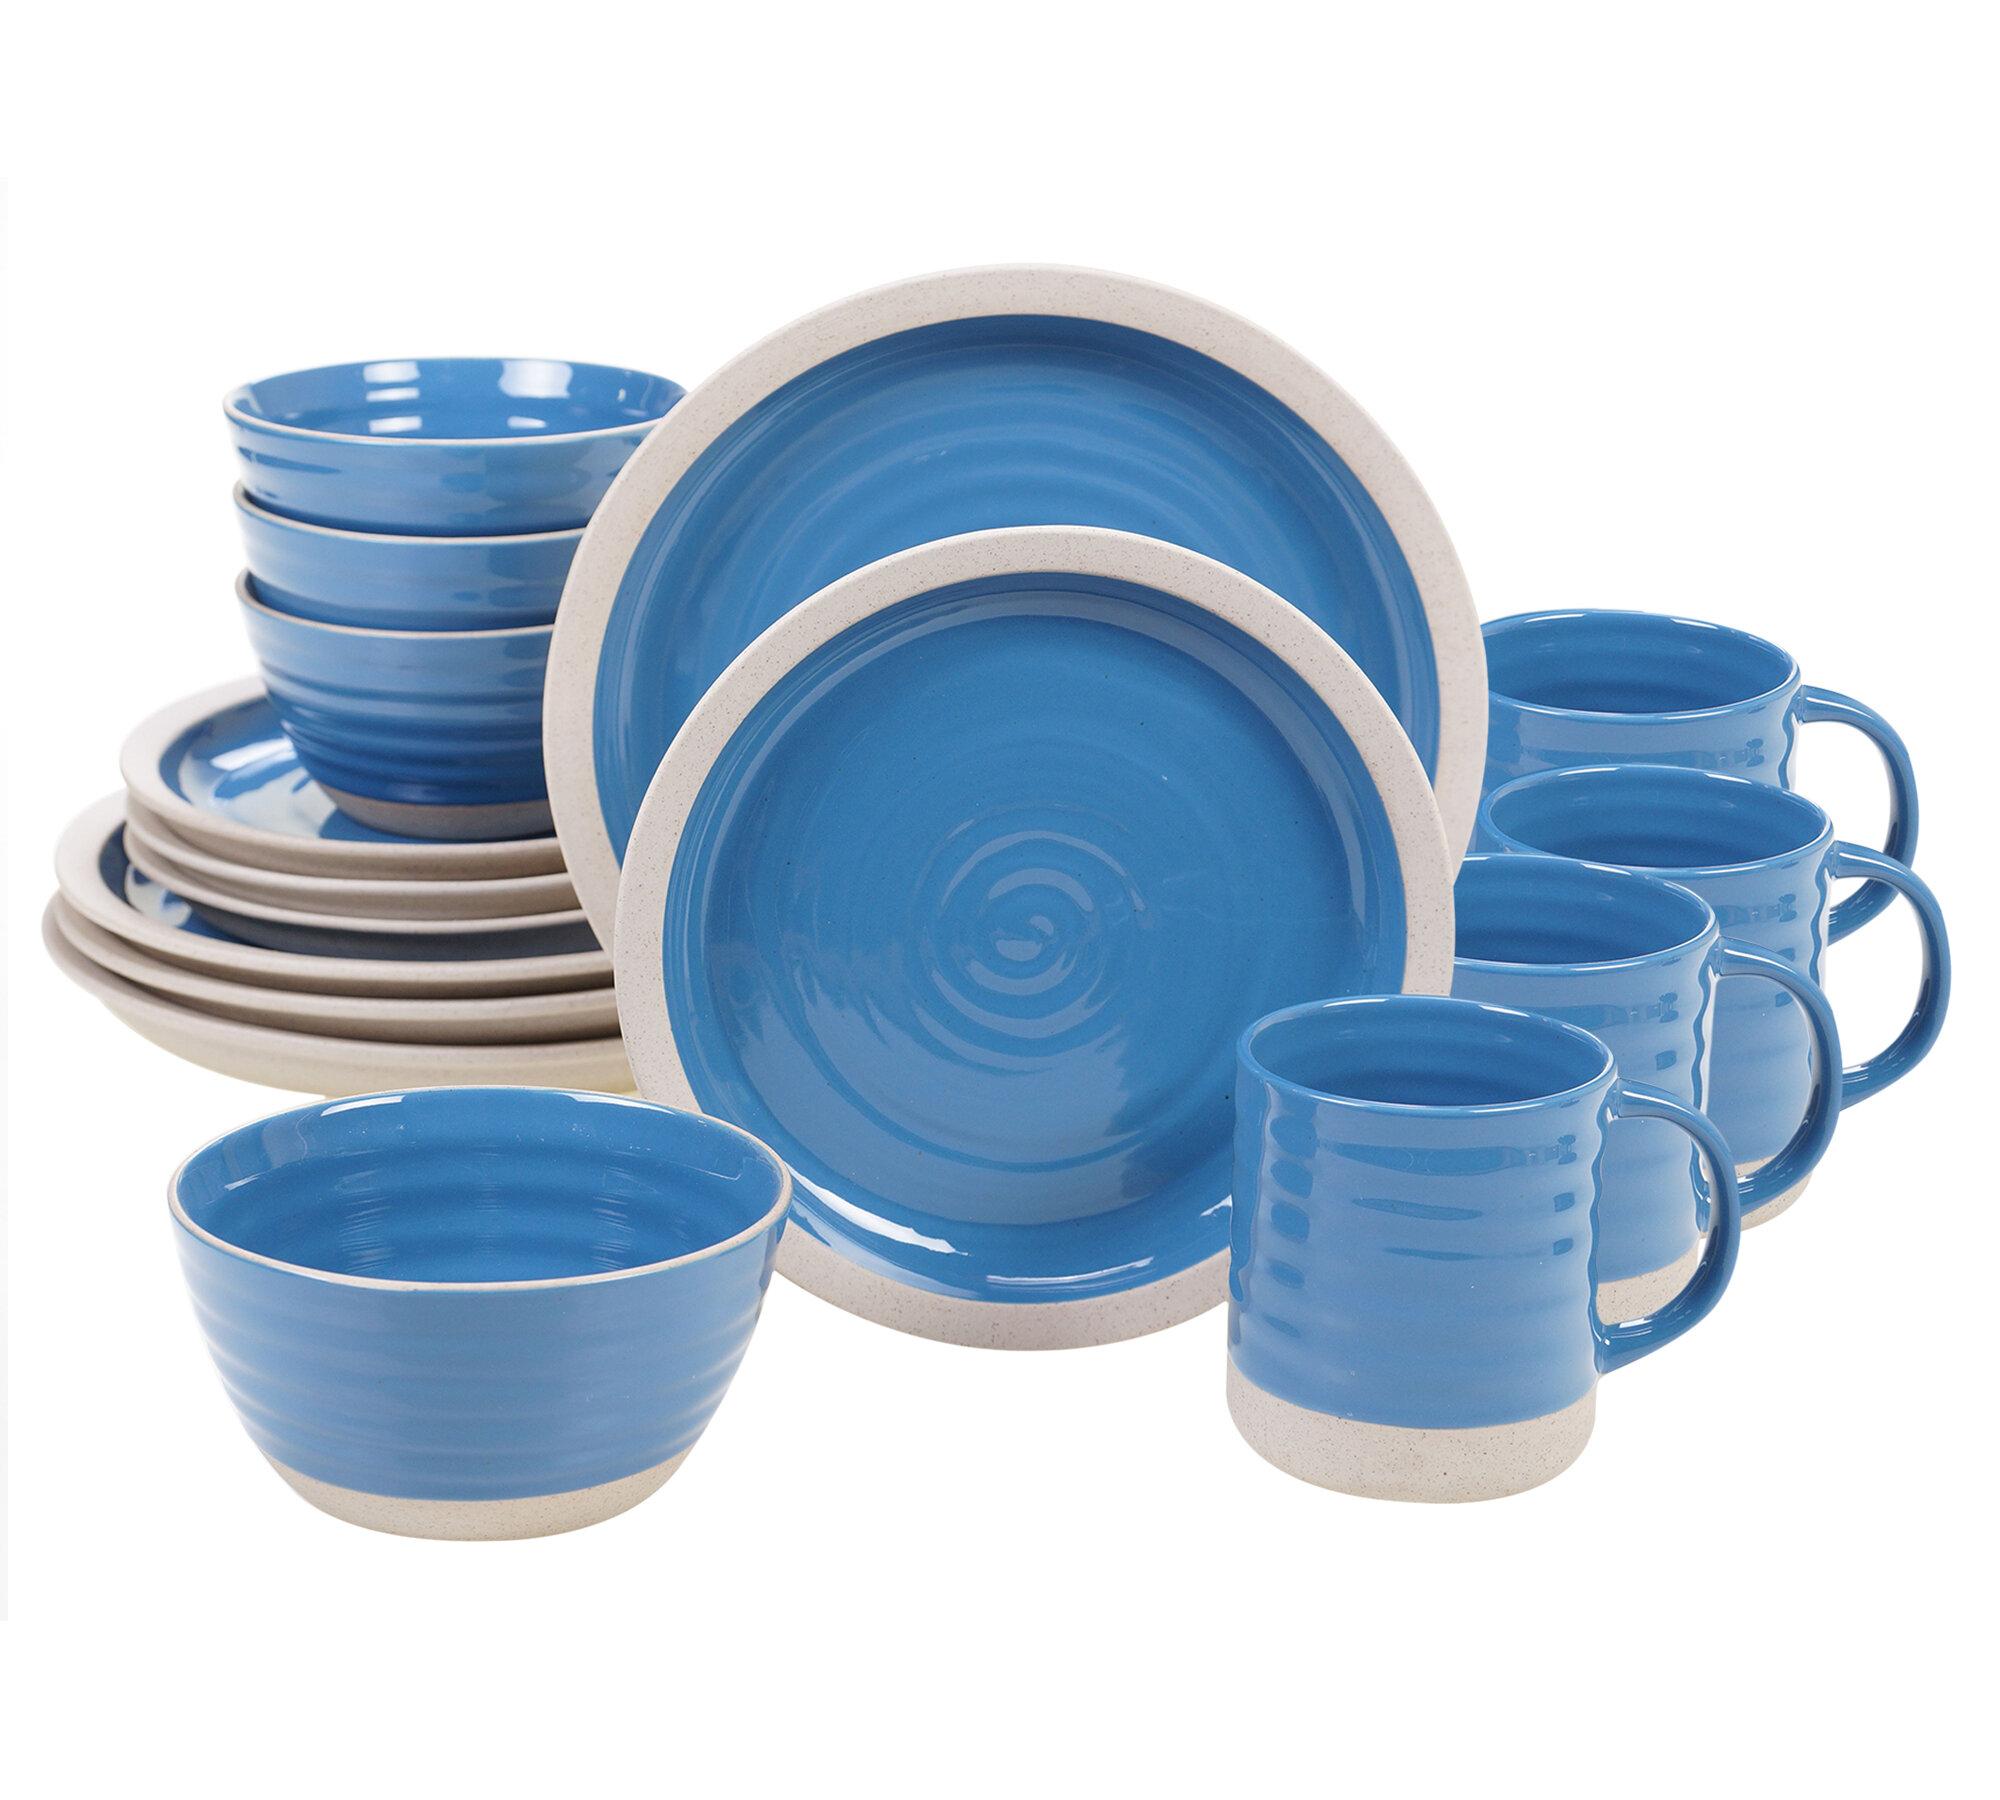 Highland Dunes Abree Artisan 16 Piece Dinnerware Set Service For